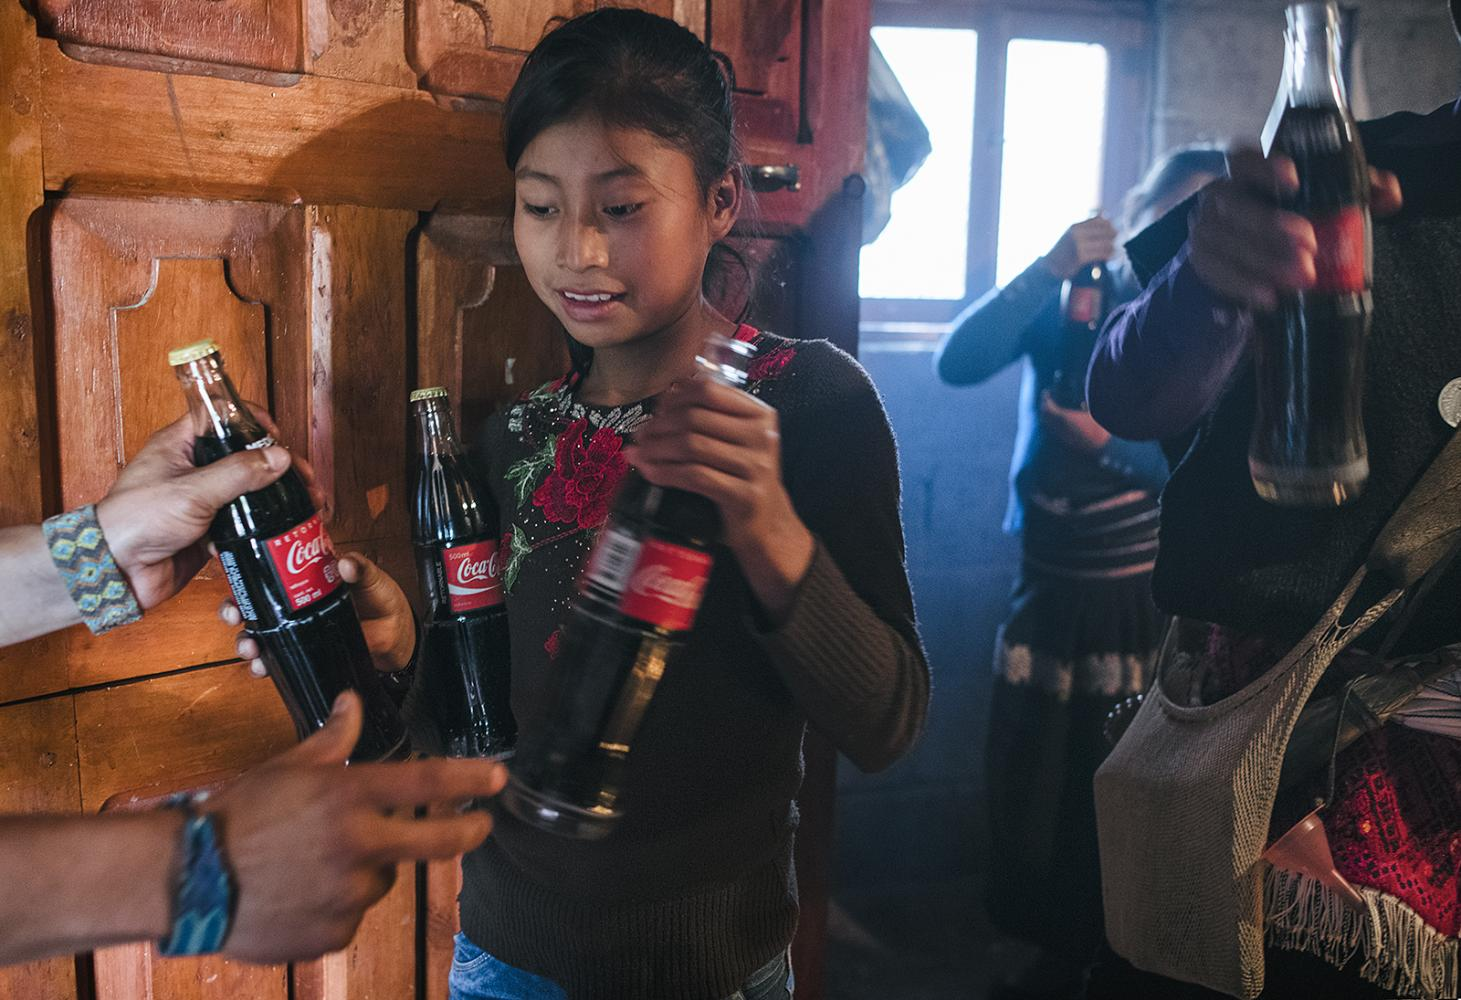 Photography image - Loading Coca_Cola_002.jpg